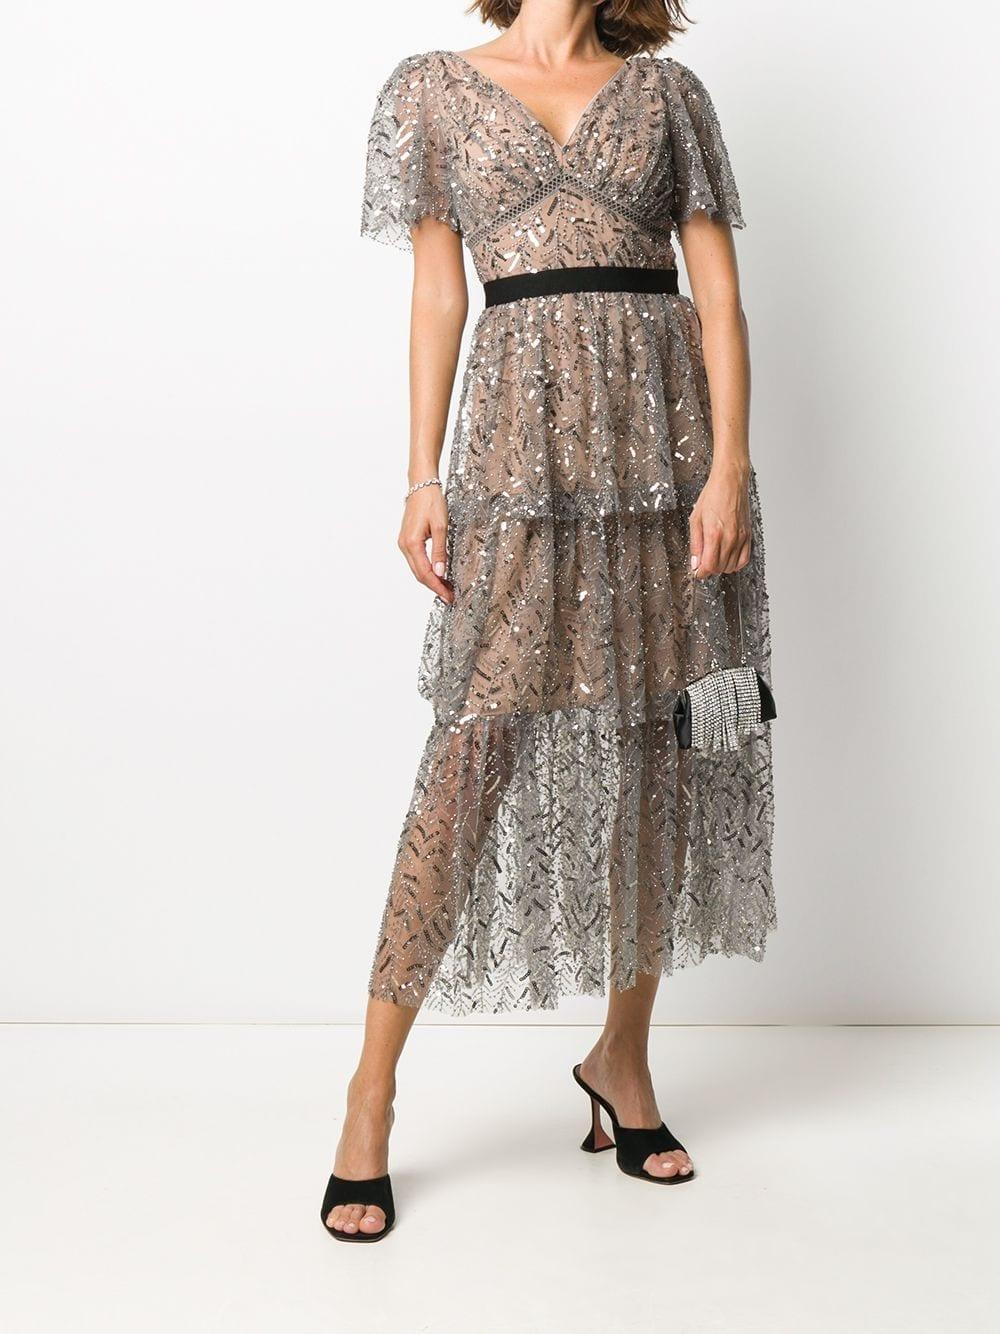 SELF-PORTRAIT Sequin Embellished Gown